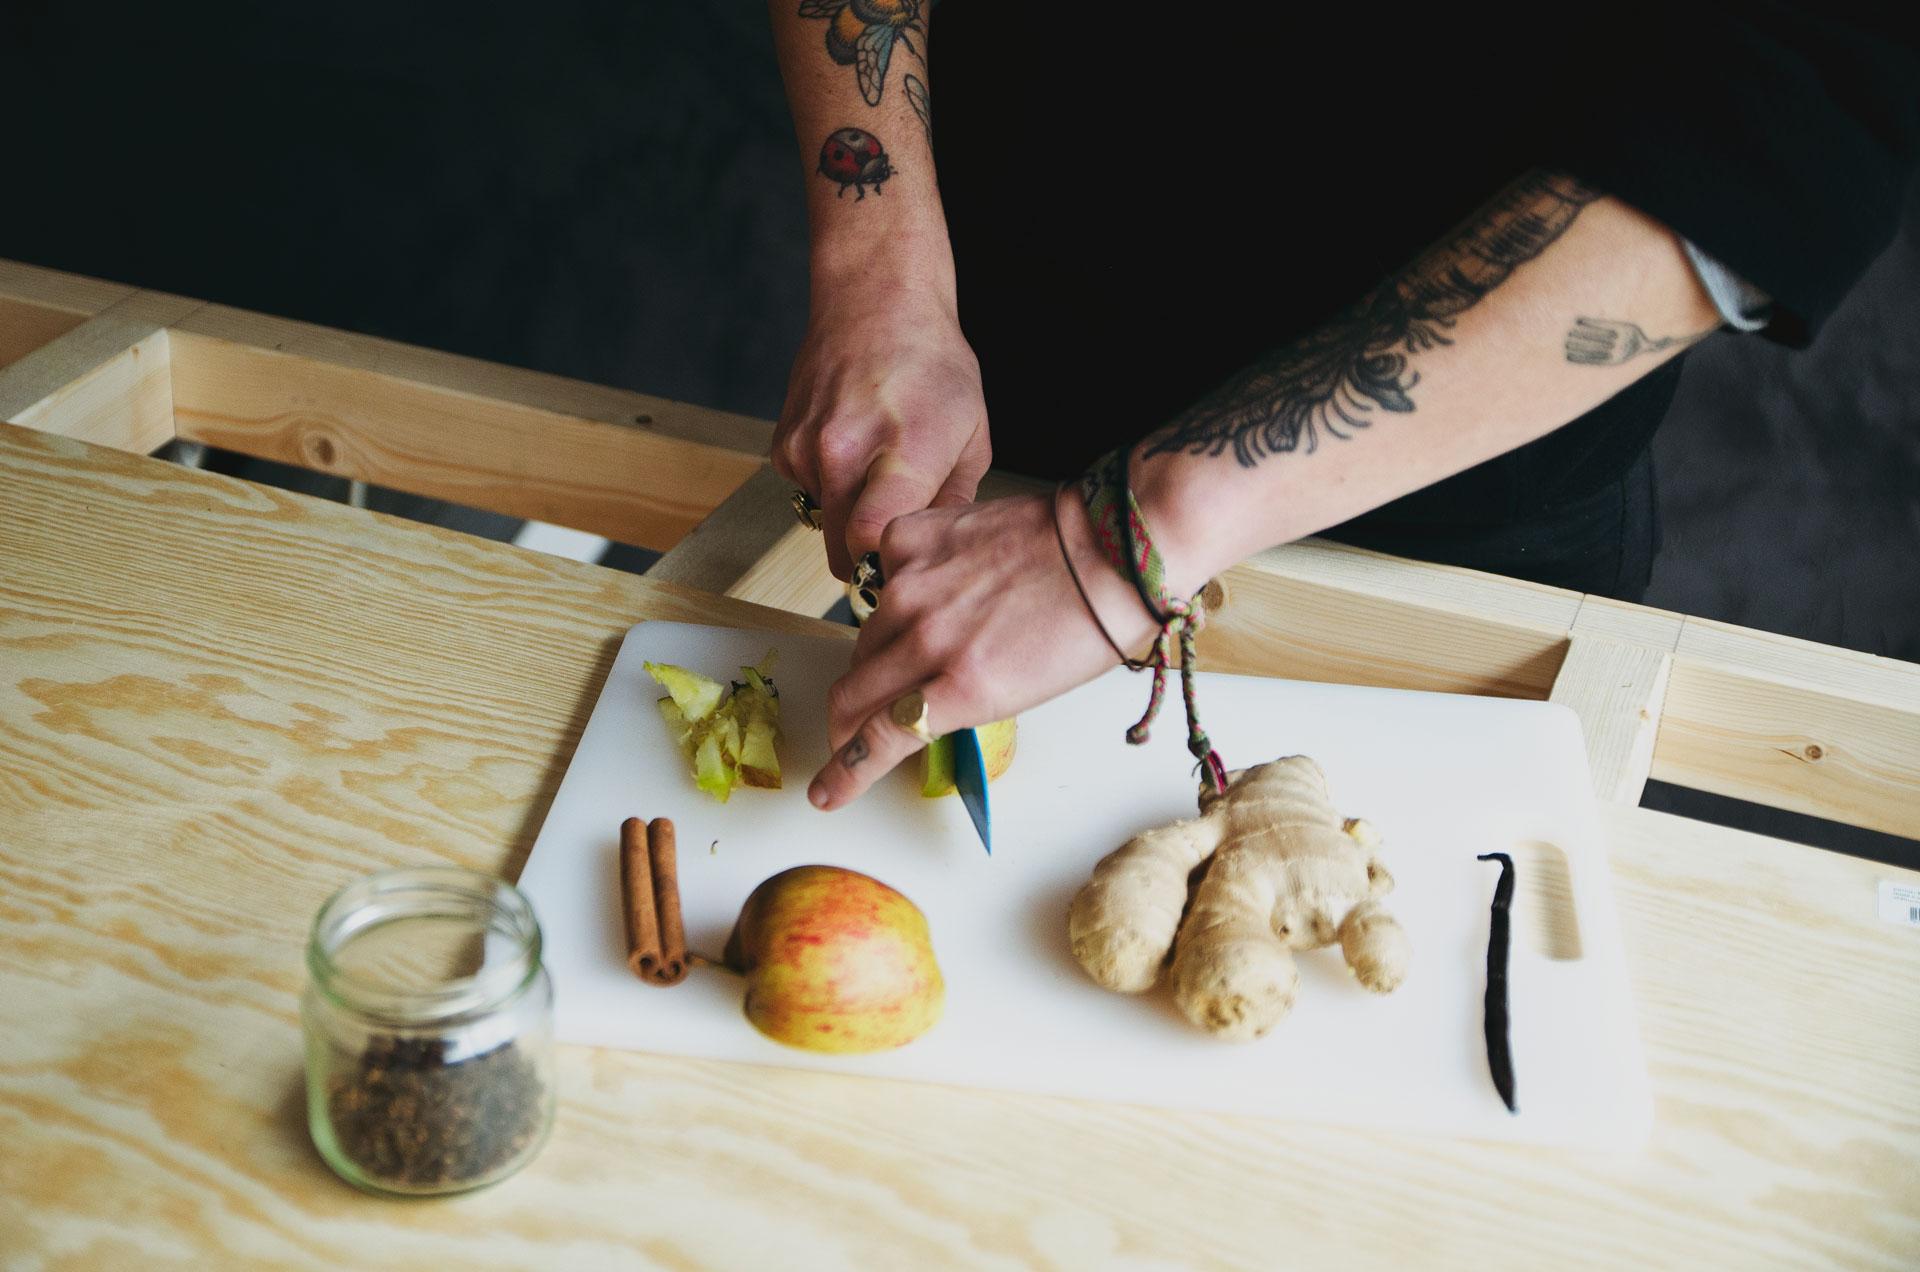 Berlin Kombucha Society preparing ingredients for a second ferment